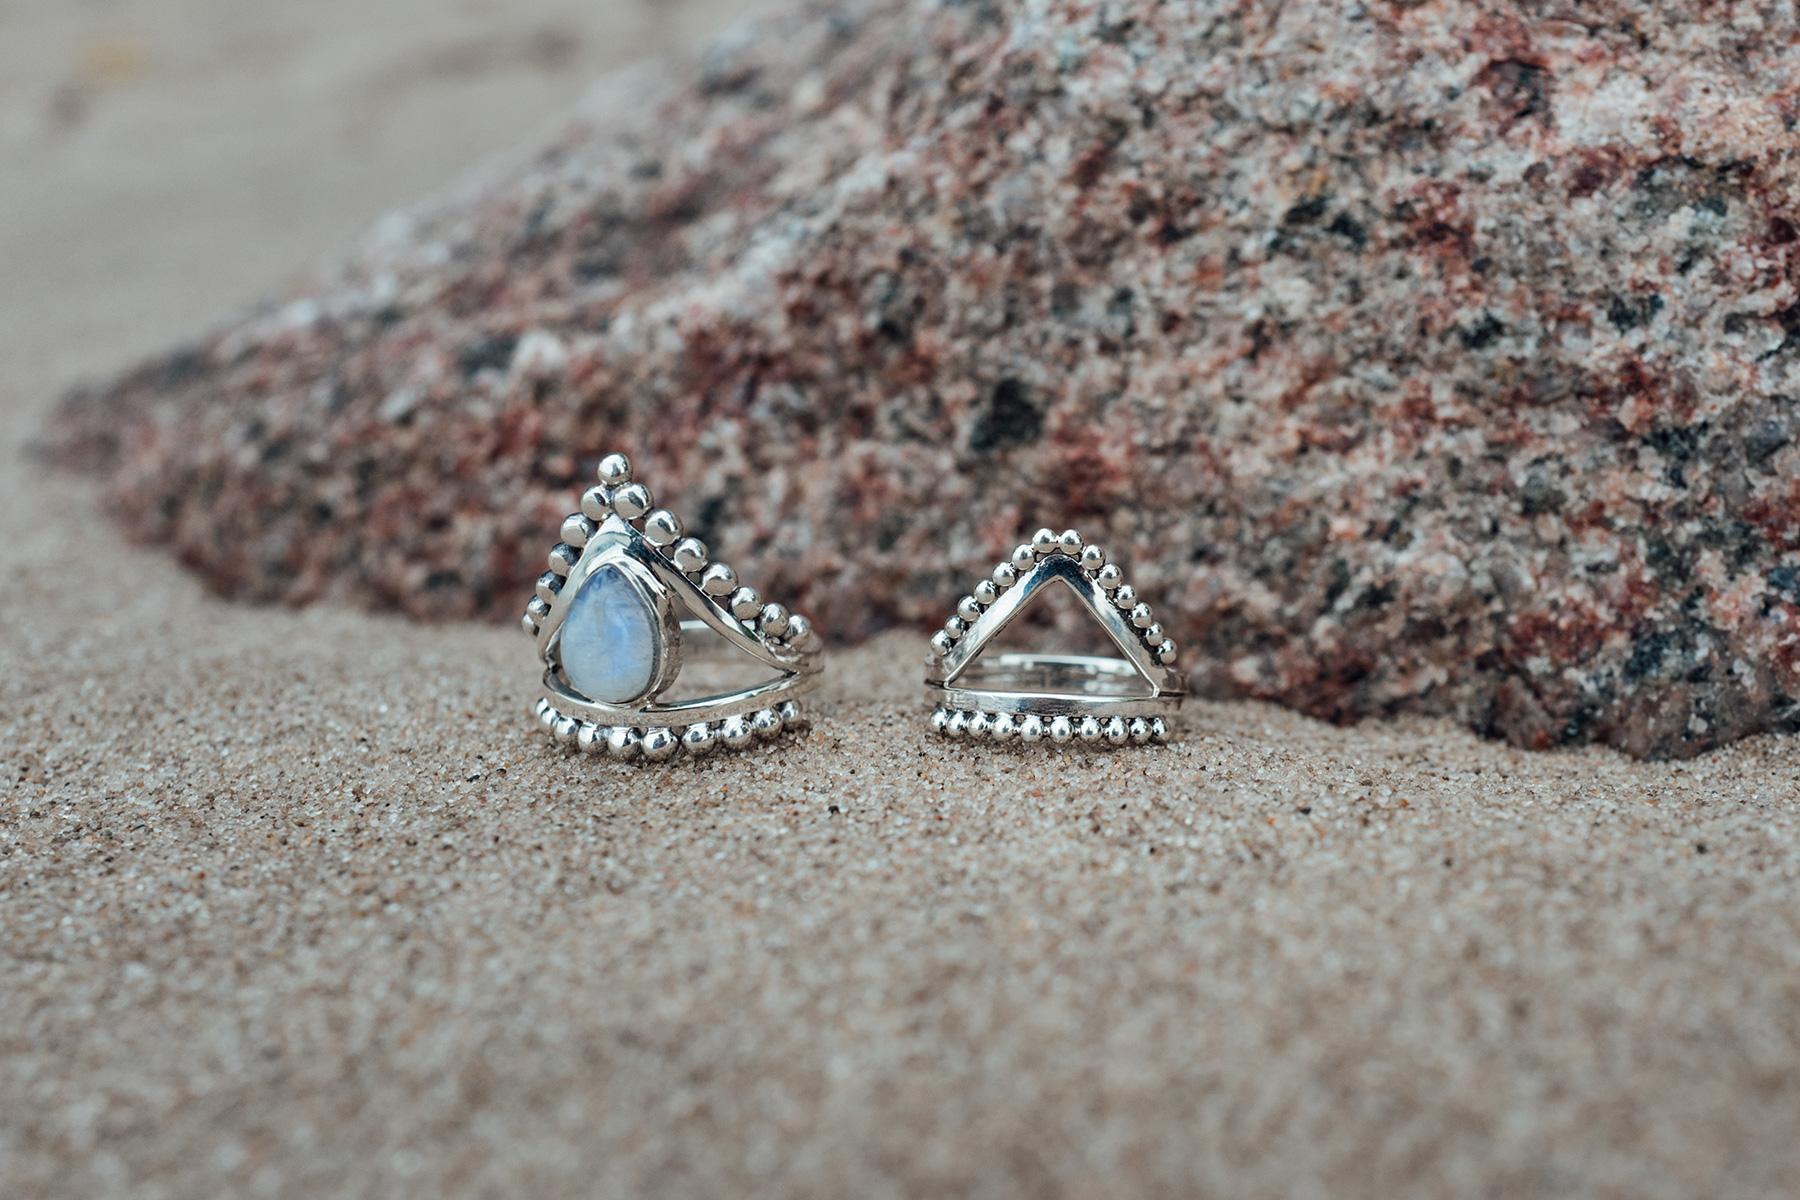 Geheimtipp Hamburg Produkt Travel Tales Jewelry Dahlina Sophie Kock 006